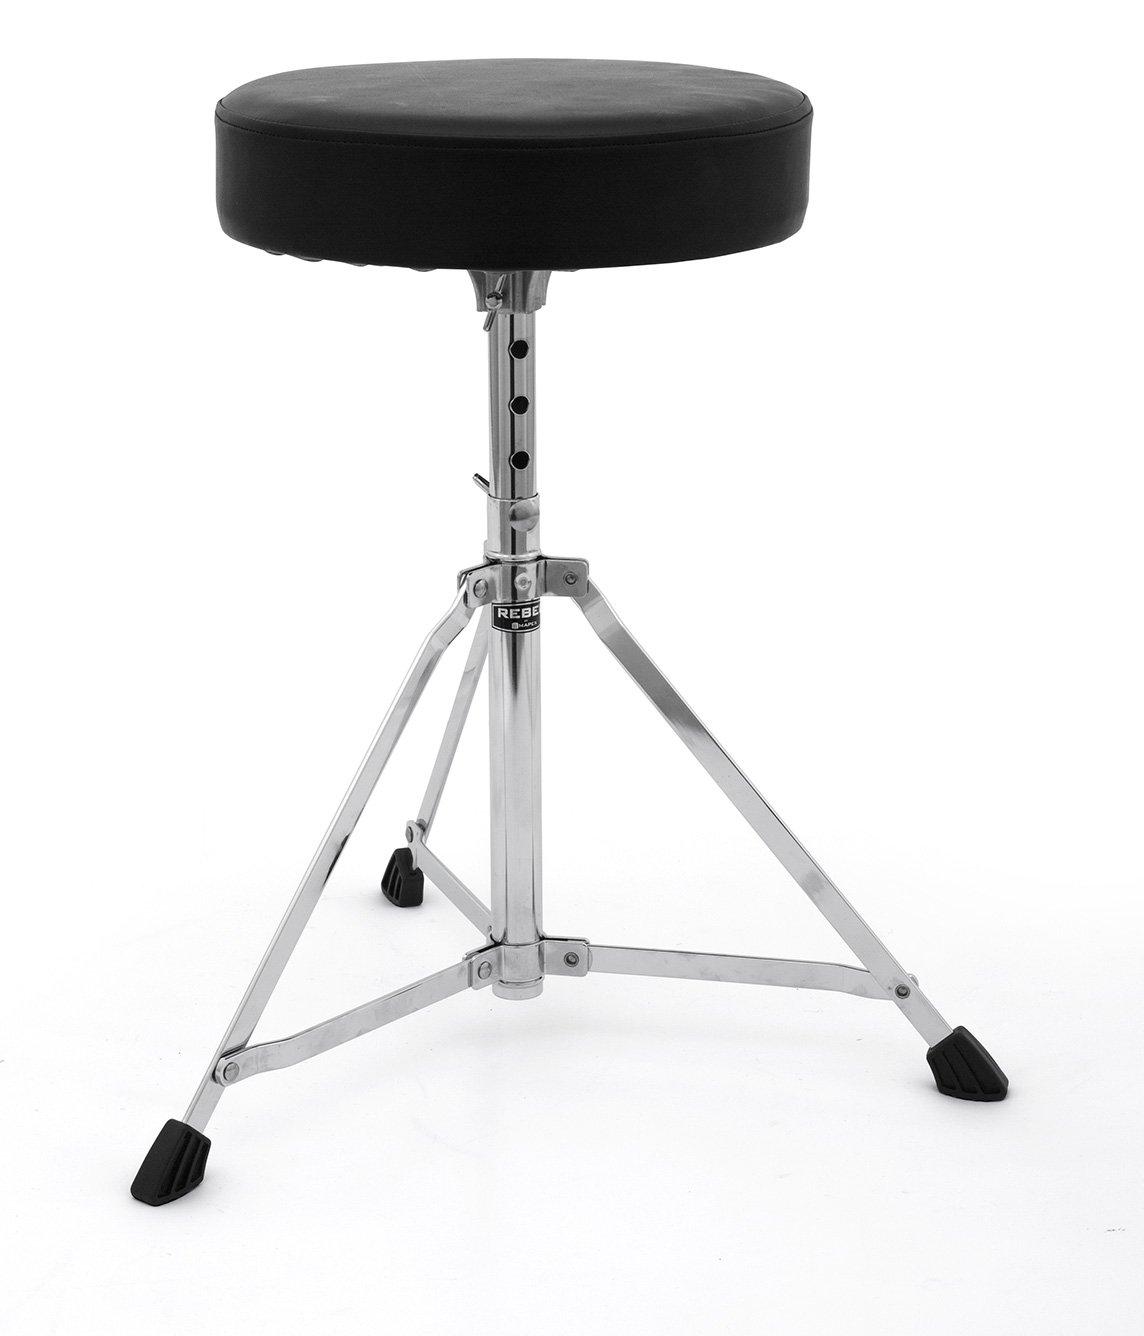 Mapex T200-RB Drum Throne Rebel Single braced 3 leg round seat